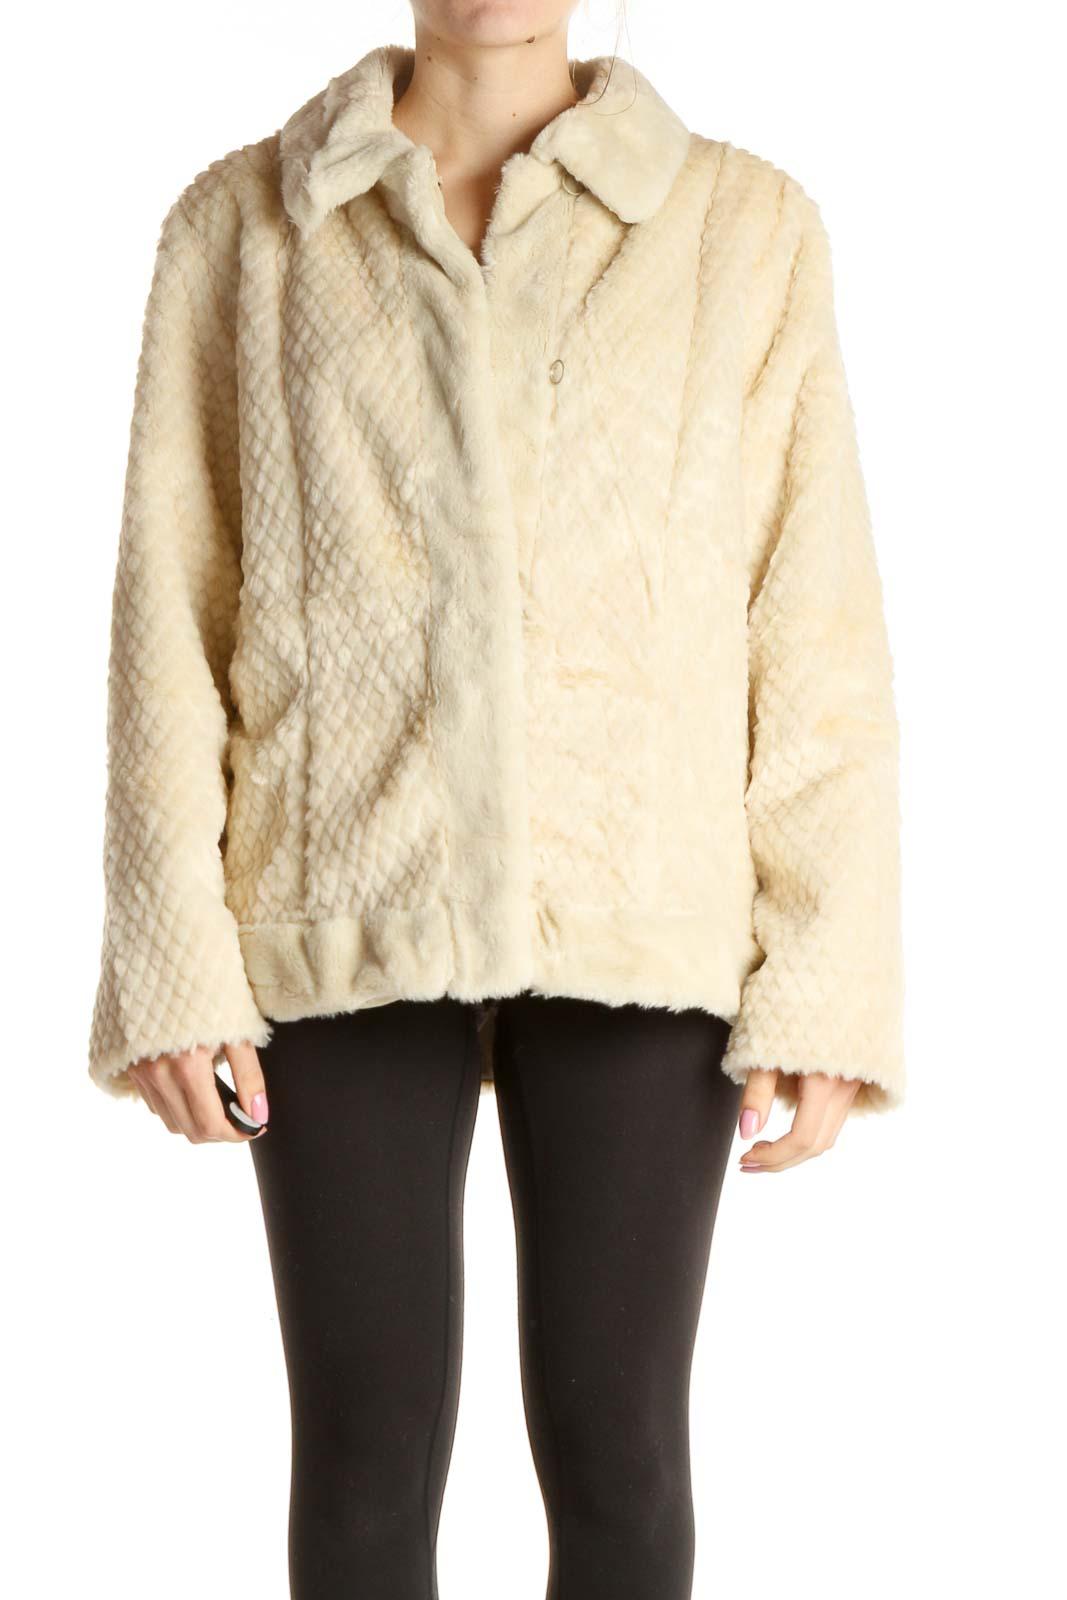 Beige Fur Jacket Front